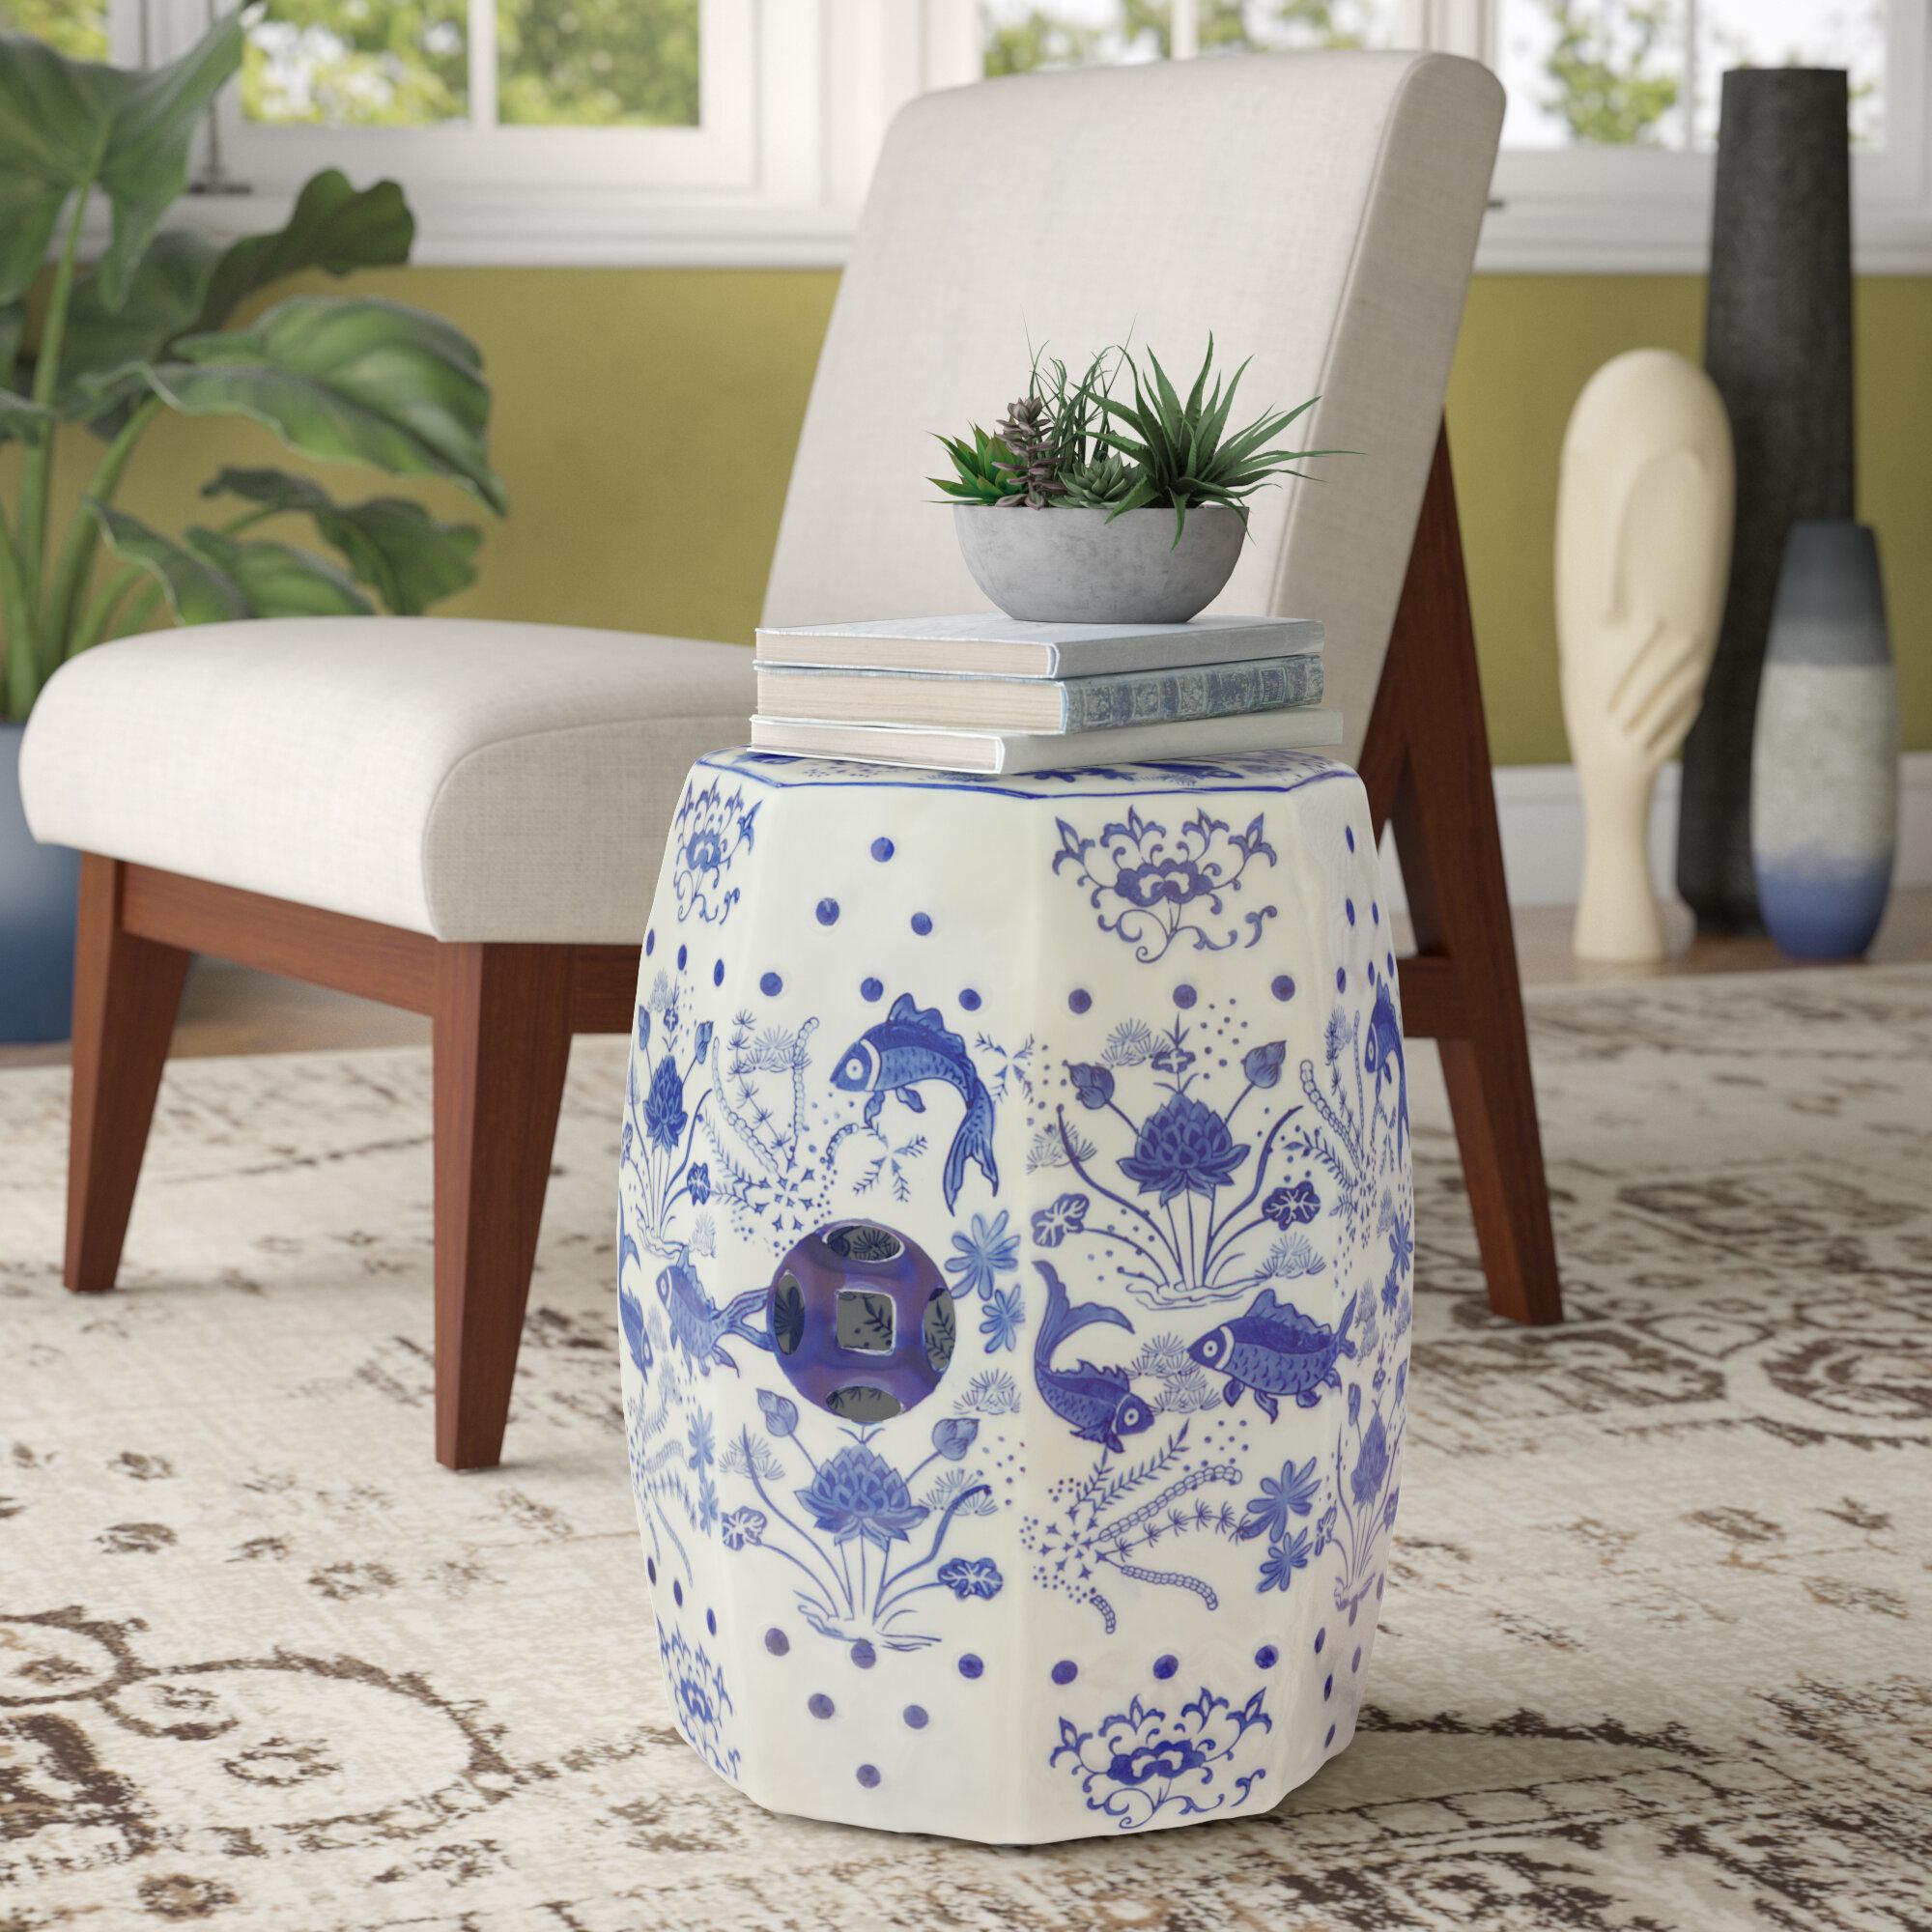 Blue Ceramic Garden Stools You'Ll Love In 2020 | Wayfair Pertaining To Wilde Poppies Ceramic Garden Stools (View 8 of 25)